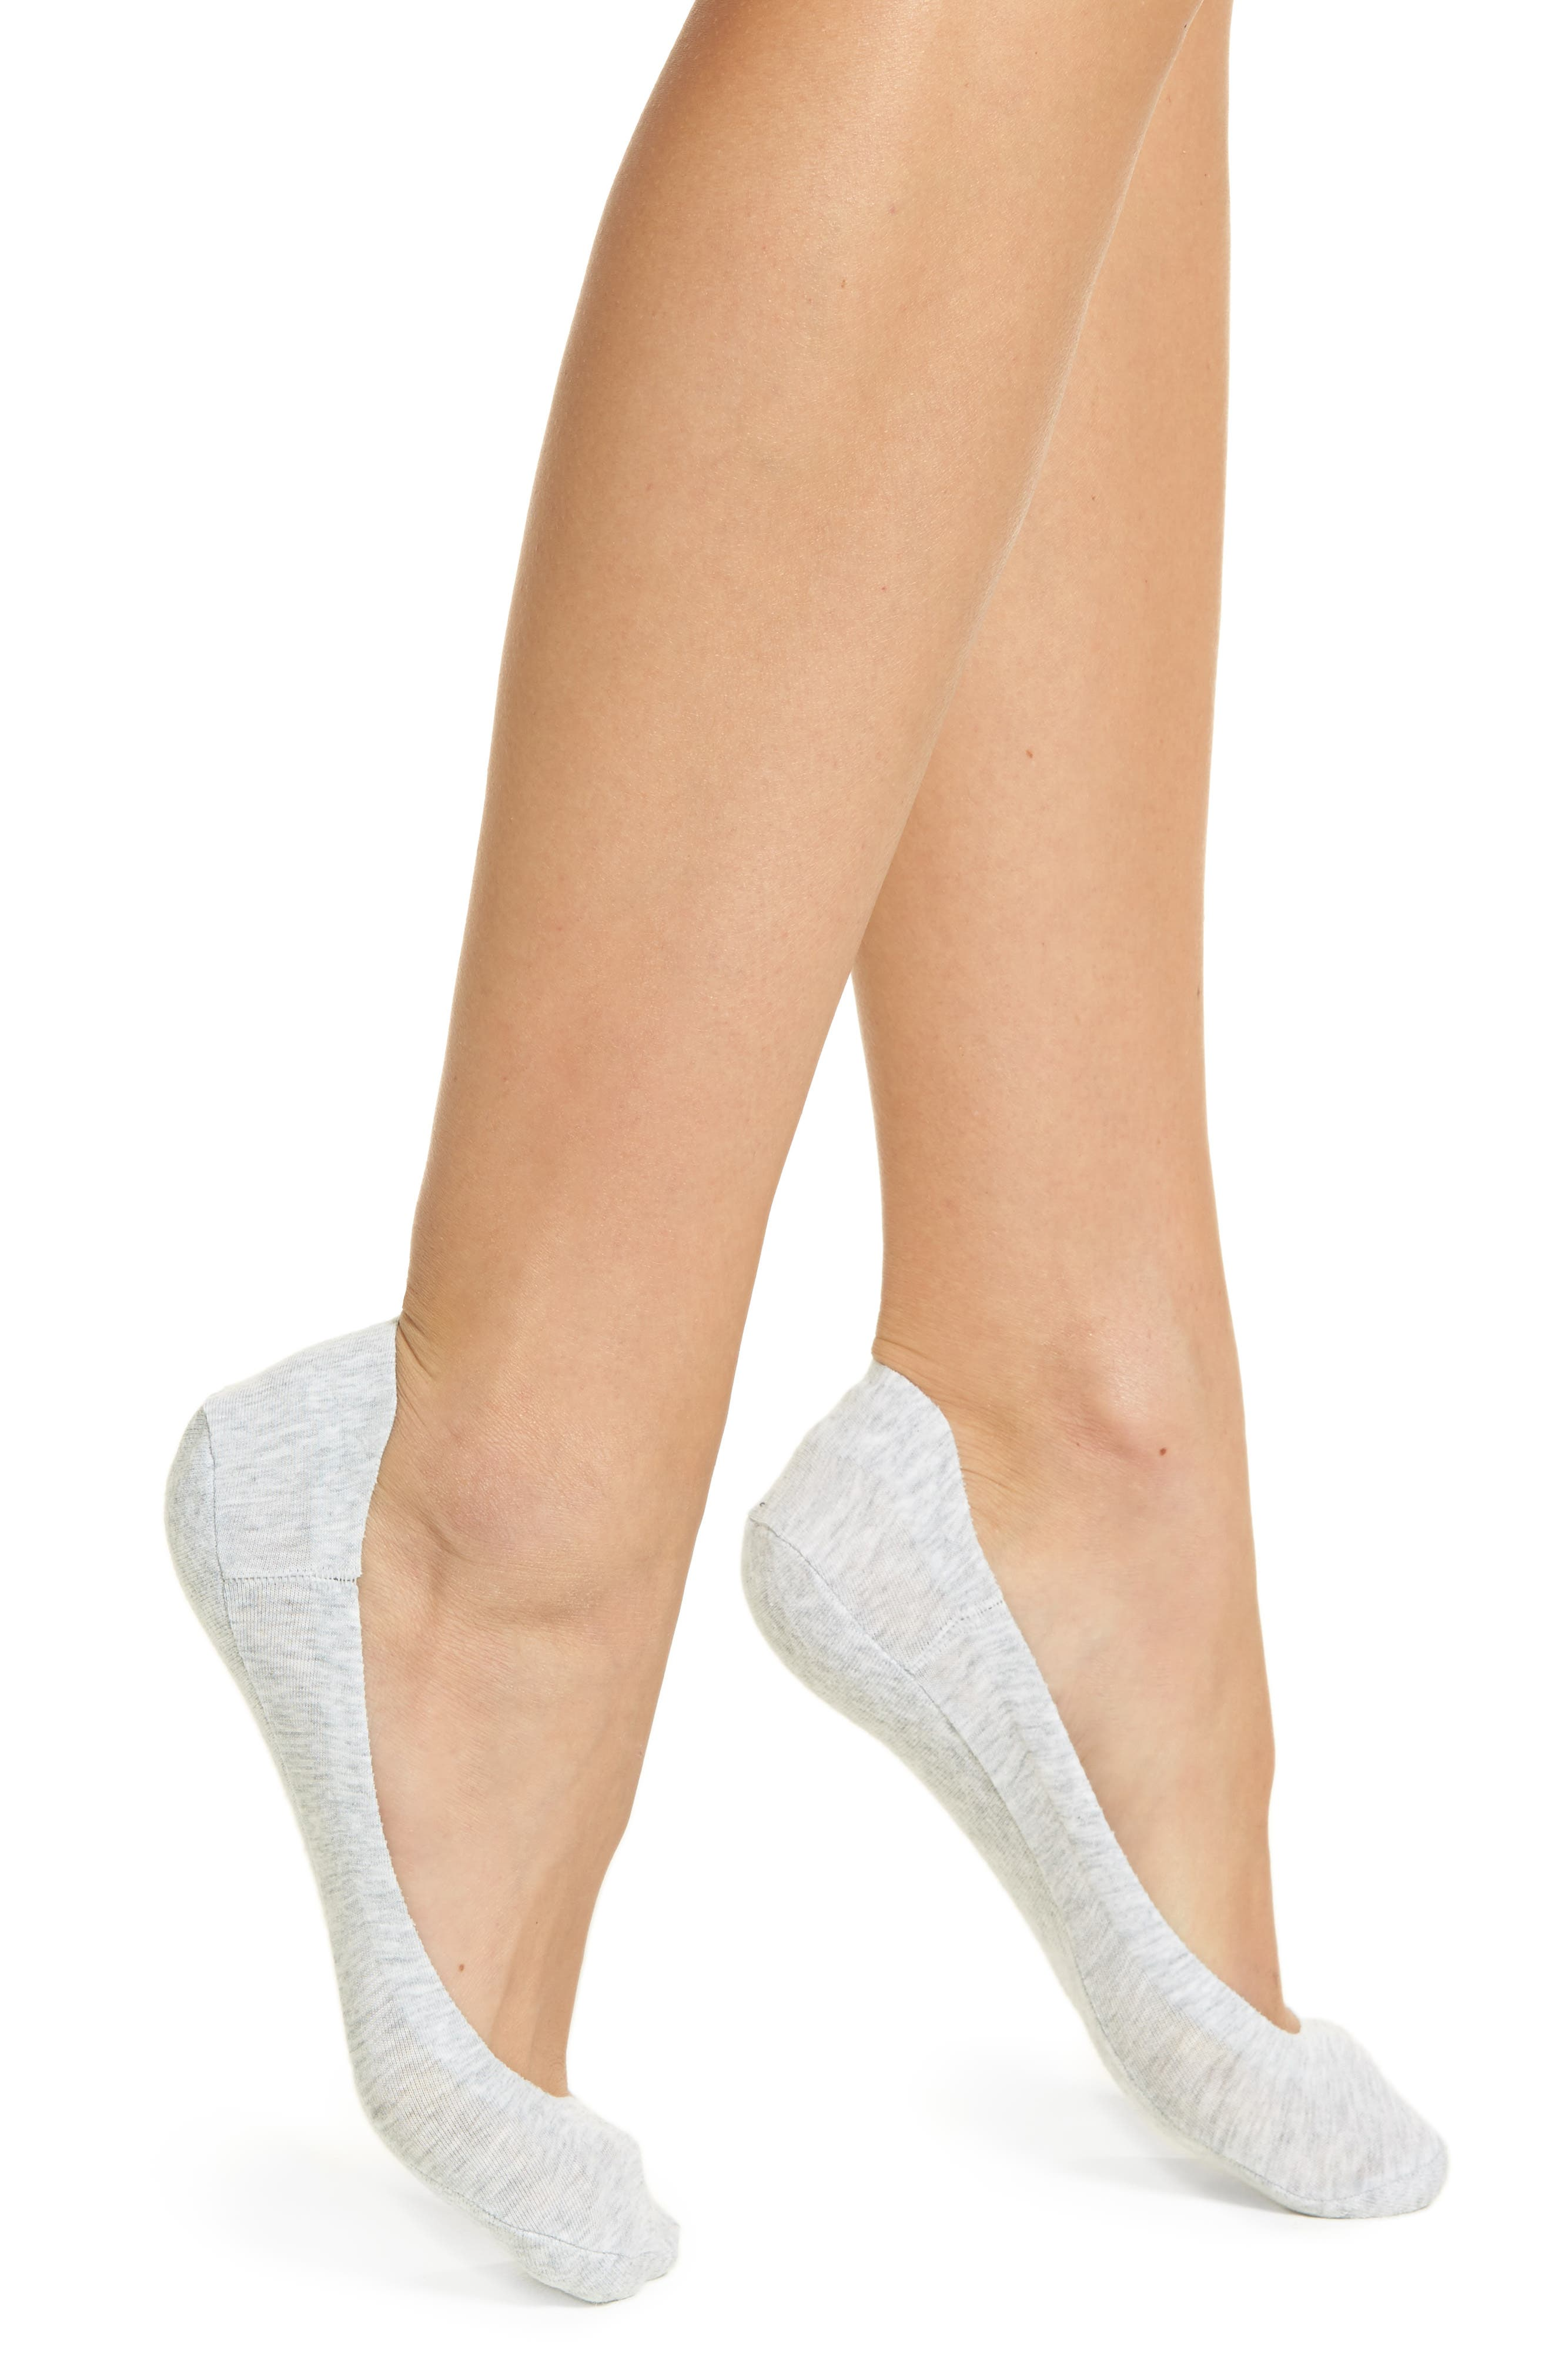 Perfect Edge No-Show Liner Socks,                             Main thumbnail 1, color,                             LIGHT CHARCOAL HEATHER